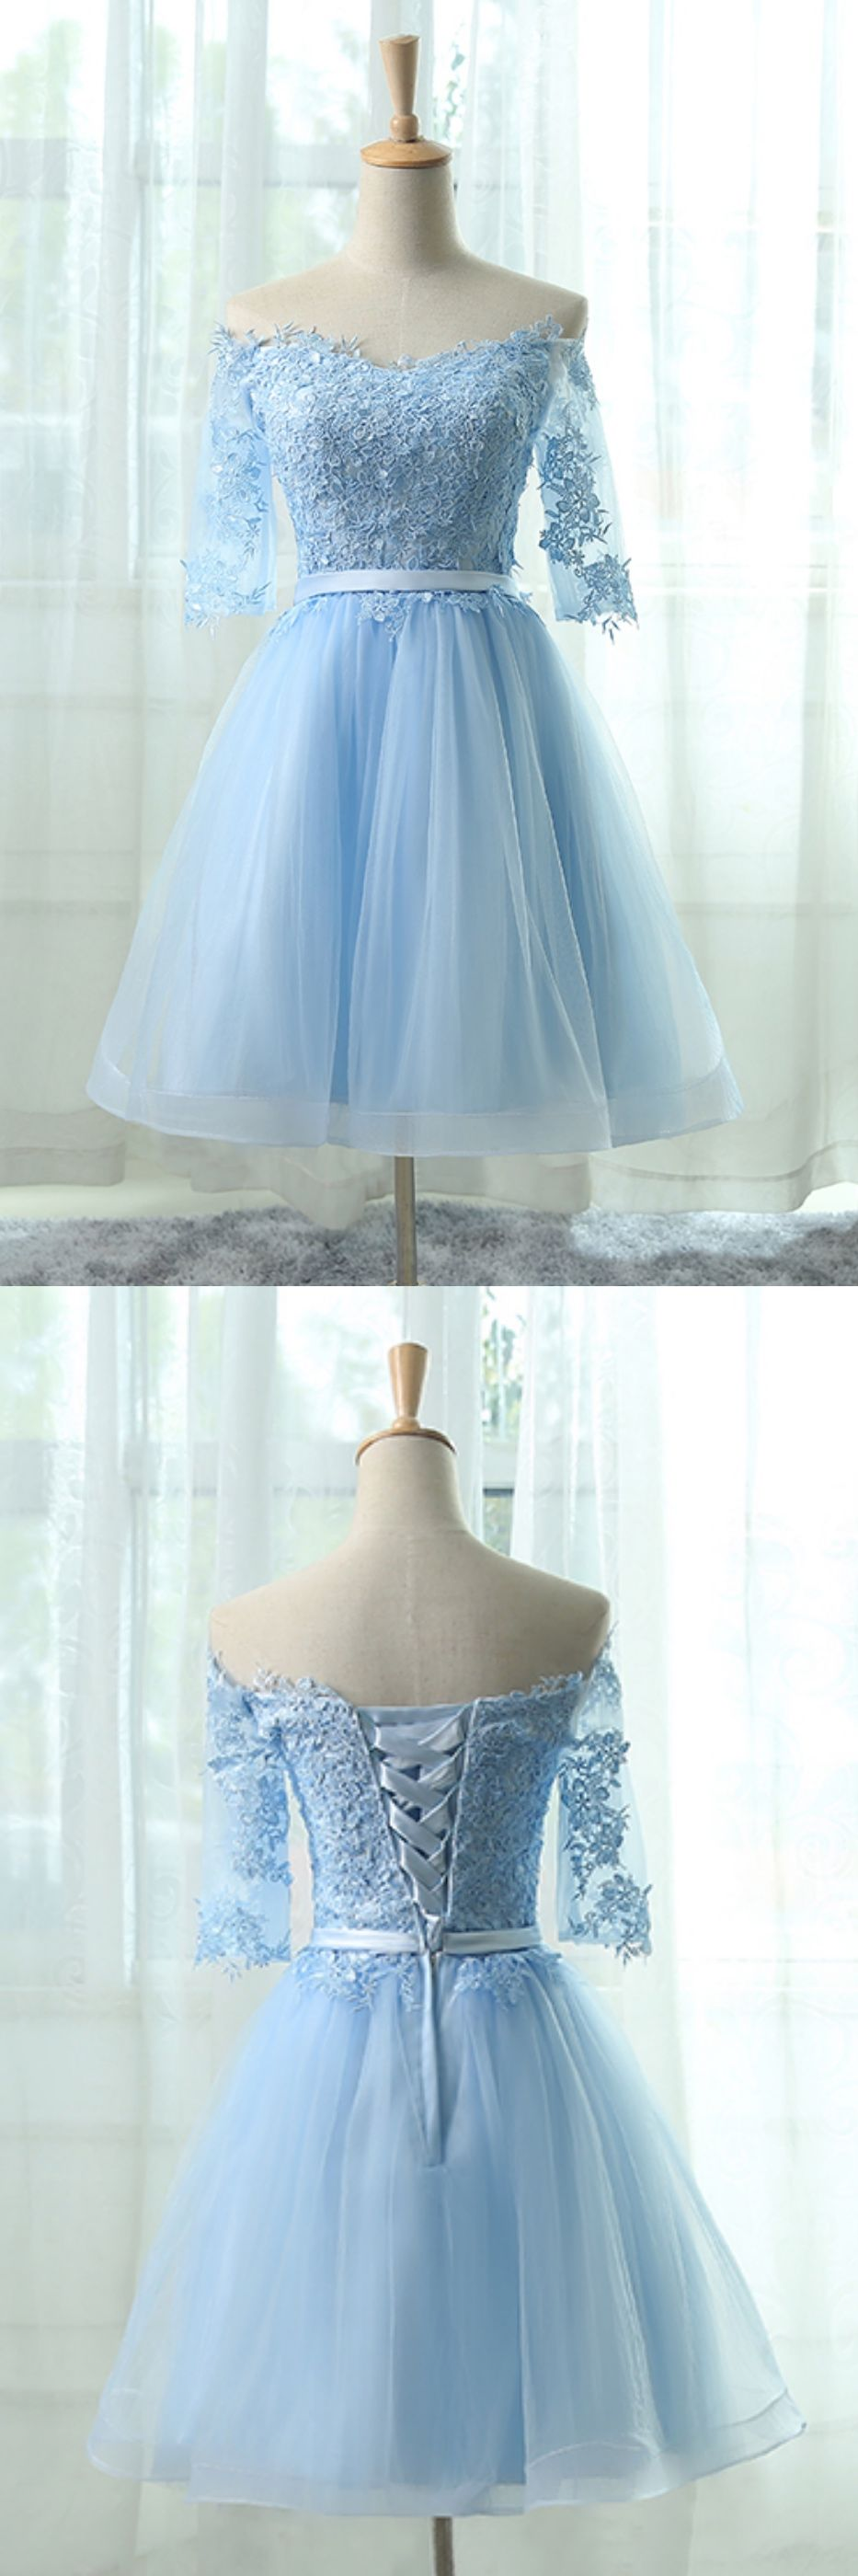 Elegant homecoming dressesaline homecoming dresseslight blue